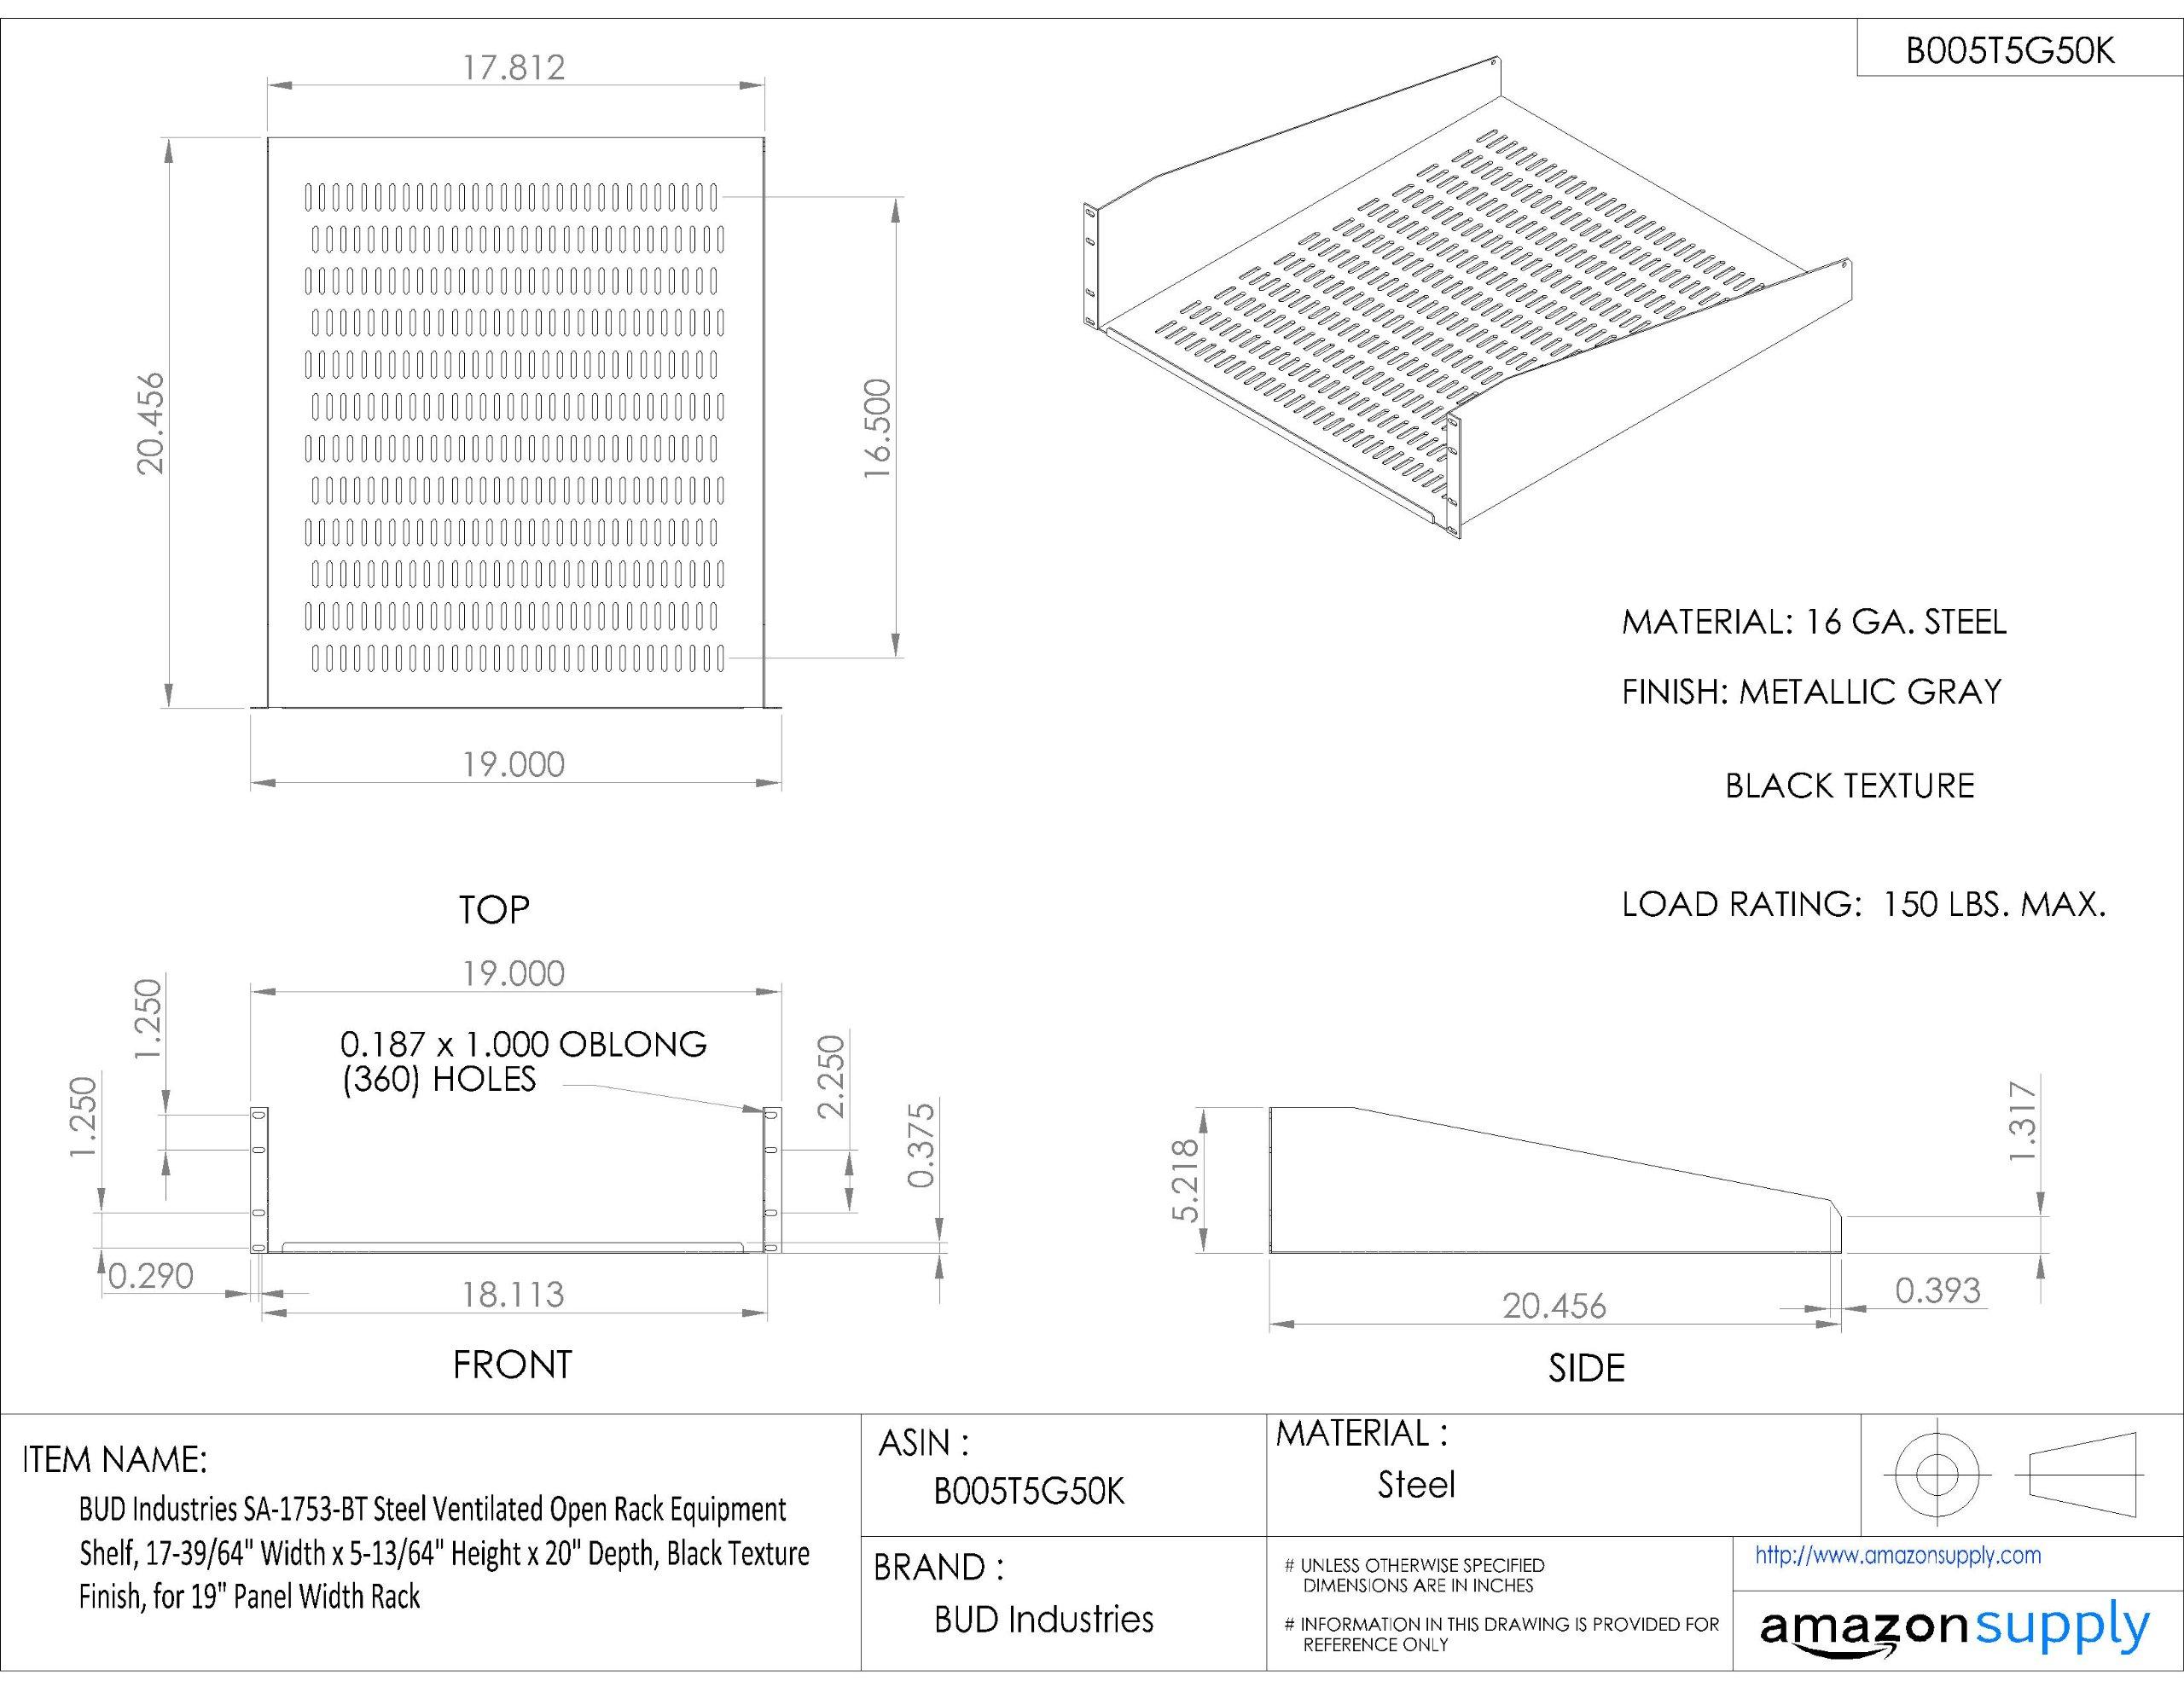 BUD Industries SA-1753-BT Steel Ventilated Open Rack Equipment Shelf, 17-39/64'' Width x 5-13/64'' Height x 20'' Depth, Black Texture Finish, for 19'' Panel Width Rack